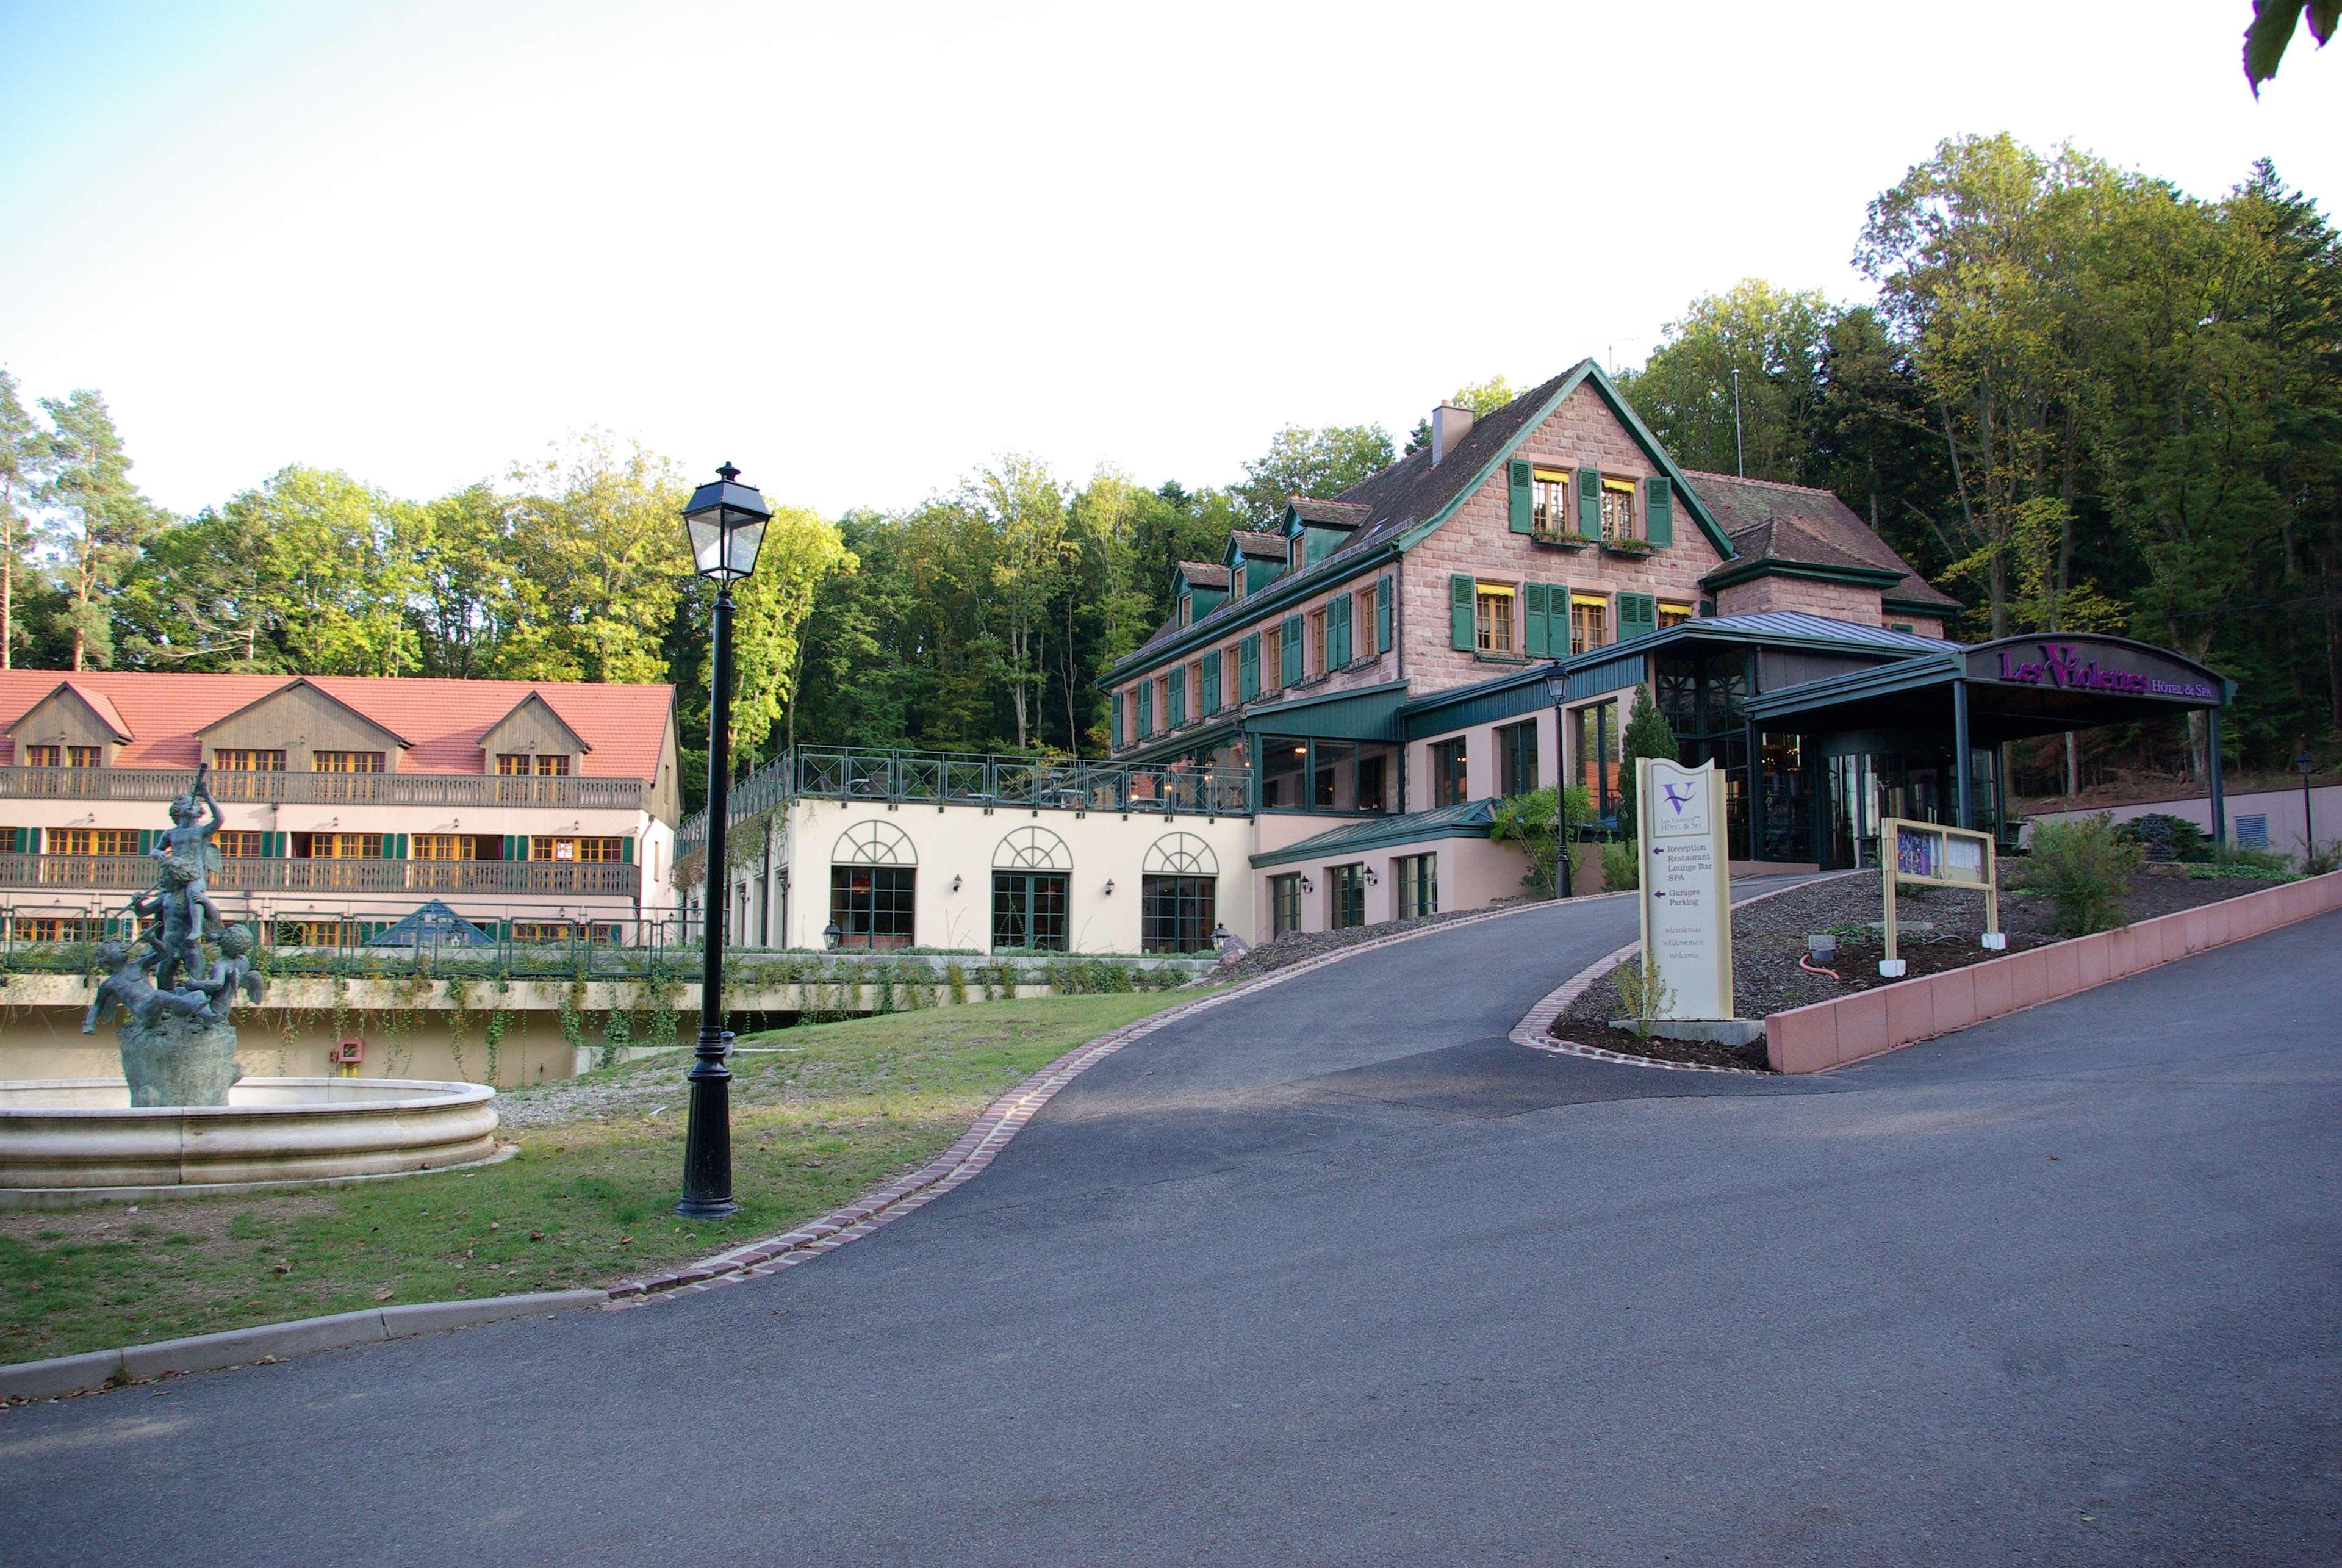 Les Violettes Hotel & Spa Alsace, BW Premier, Haut-Rhin